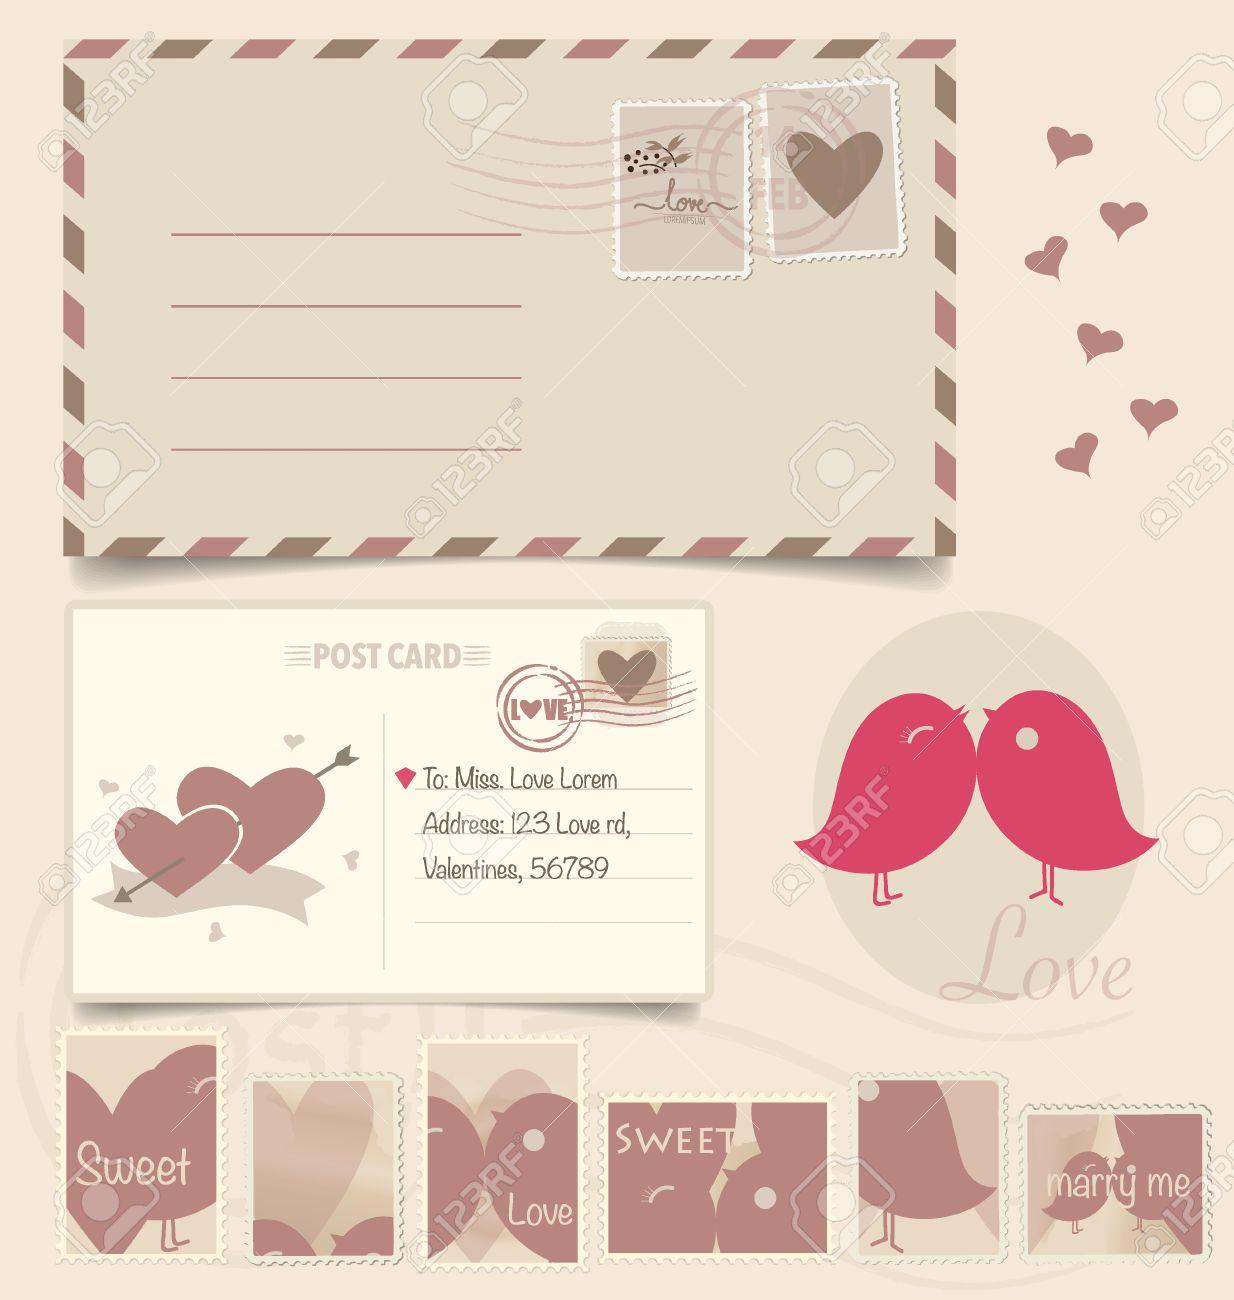 How to scrapbook wedding cards - Vector Vintage Postcard Background And Postage Stamps For Wedding Card Design Invitation Card Design Congratulation Card Design Scrapbook Design